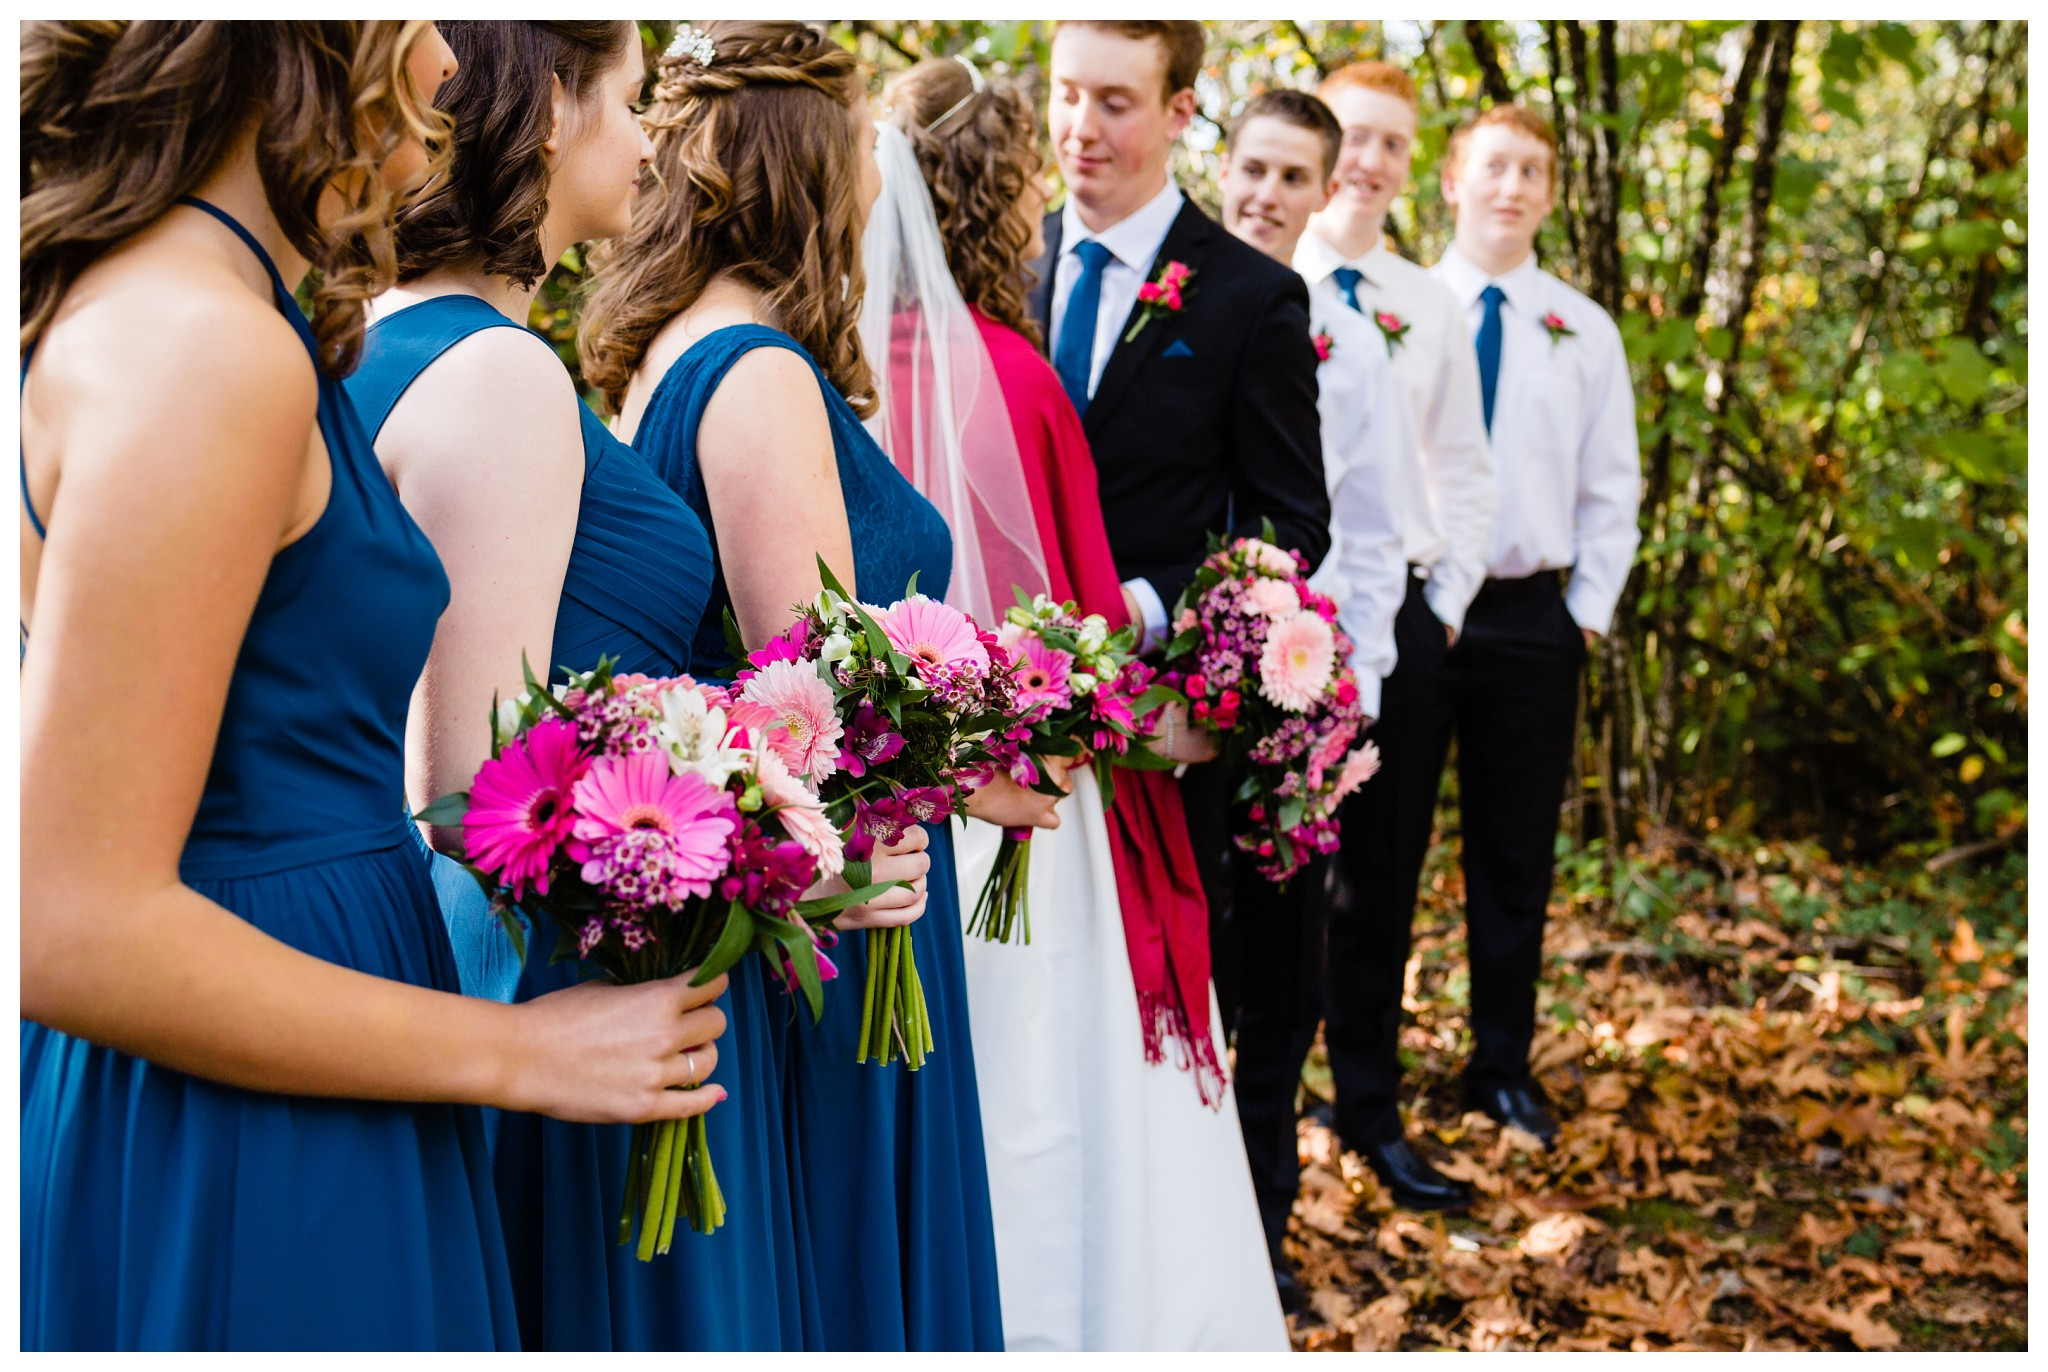 Aldergrove Park Christian Church Wedding Photography Pink Flowers Blue Bridesmaid Dress Fall_0089.jpg